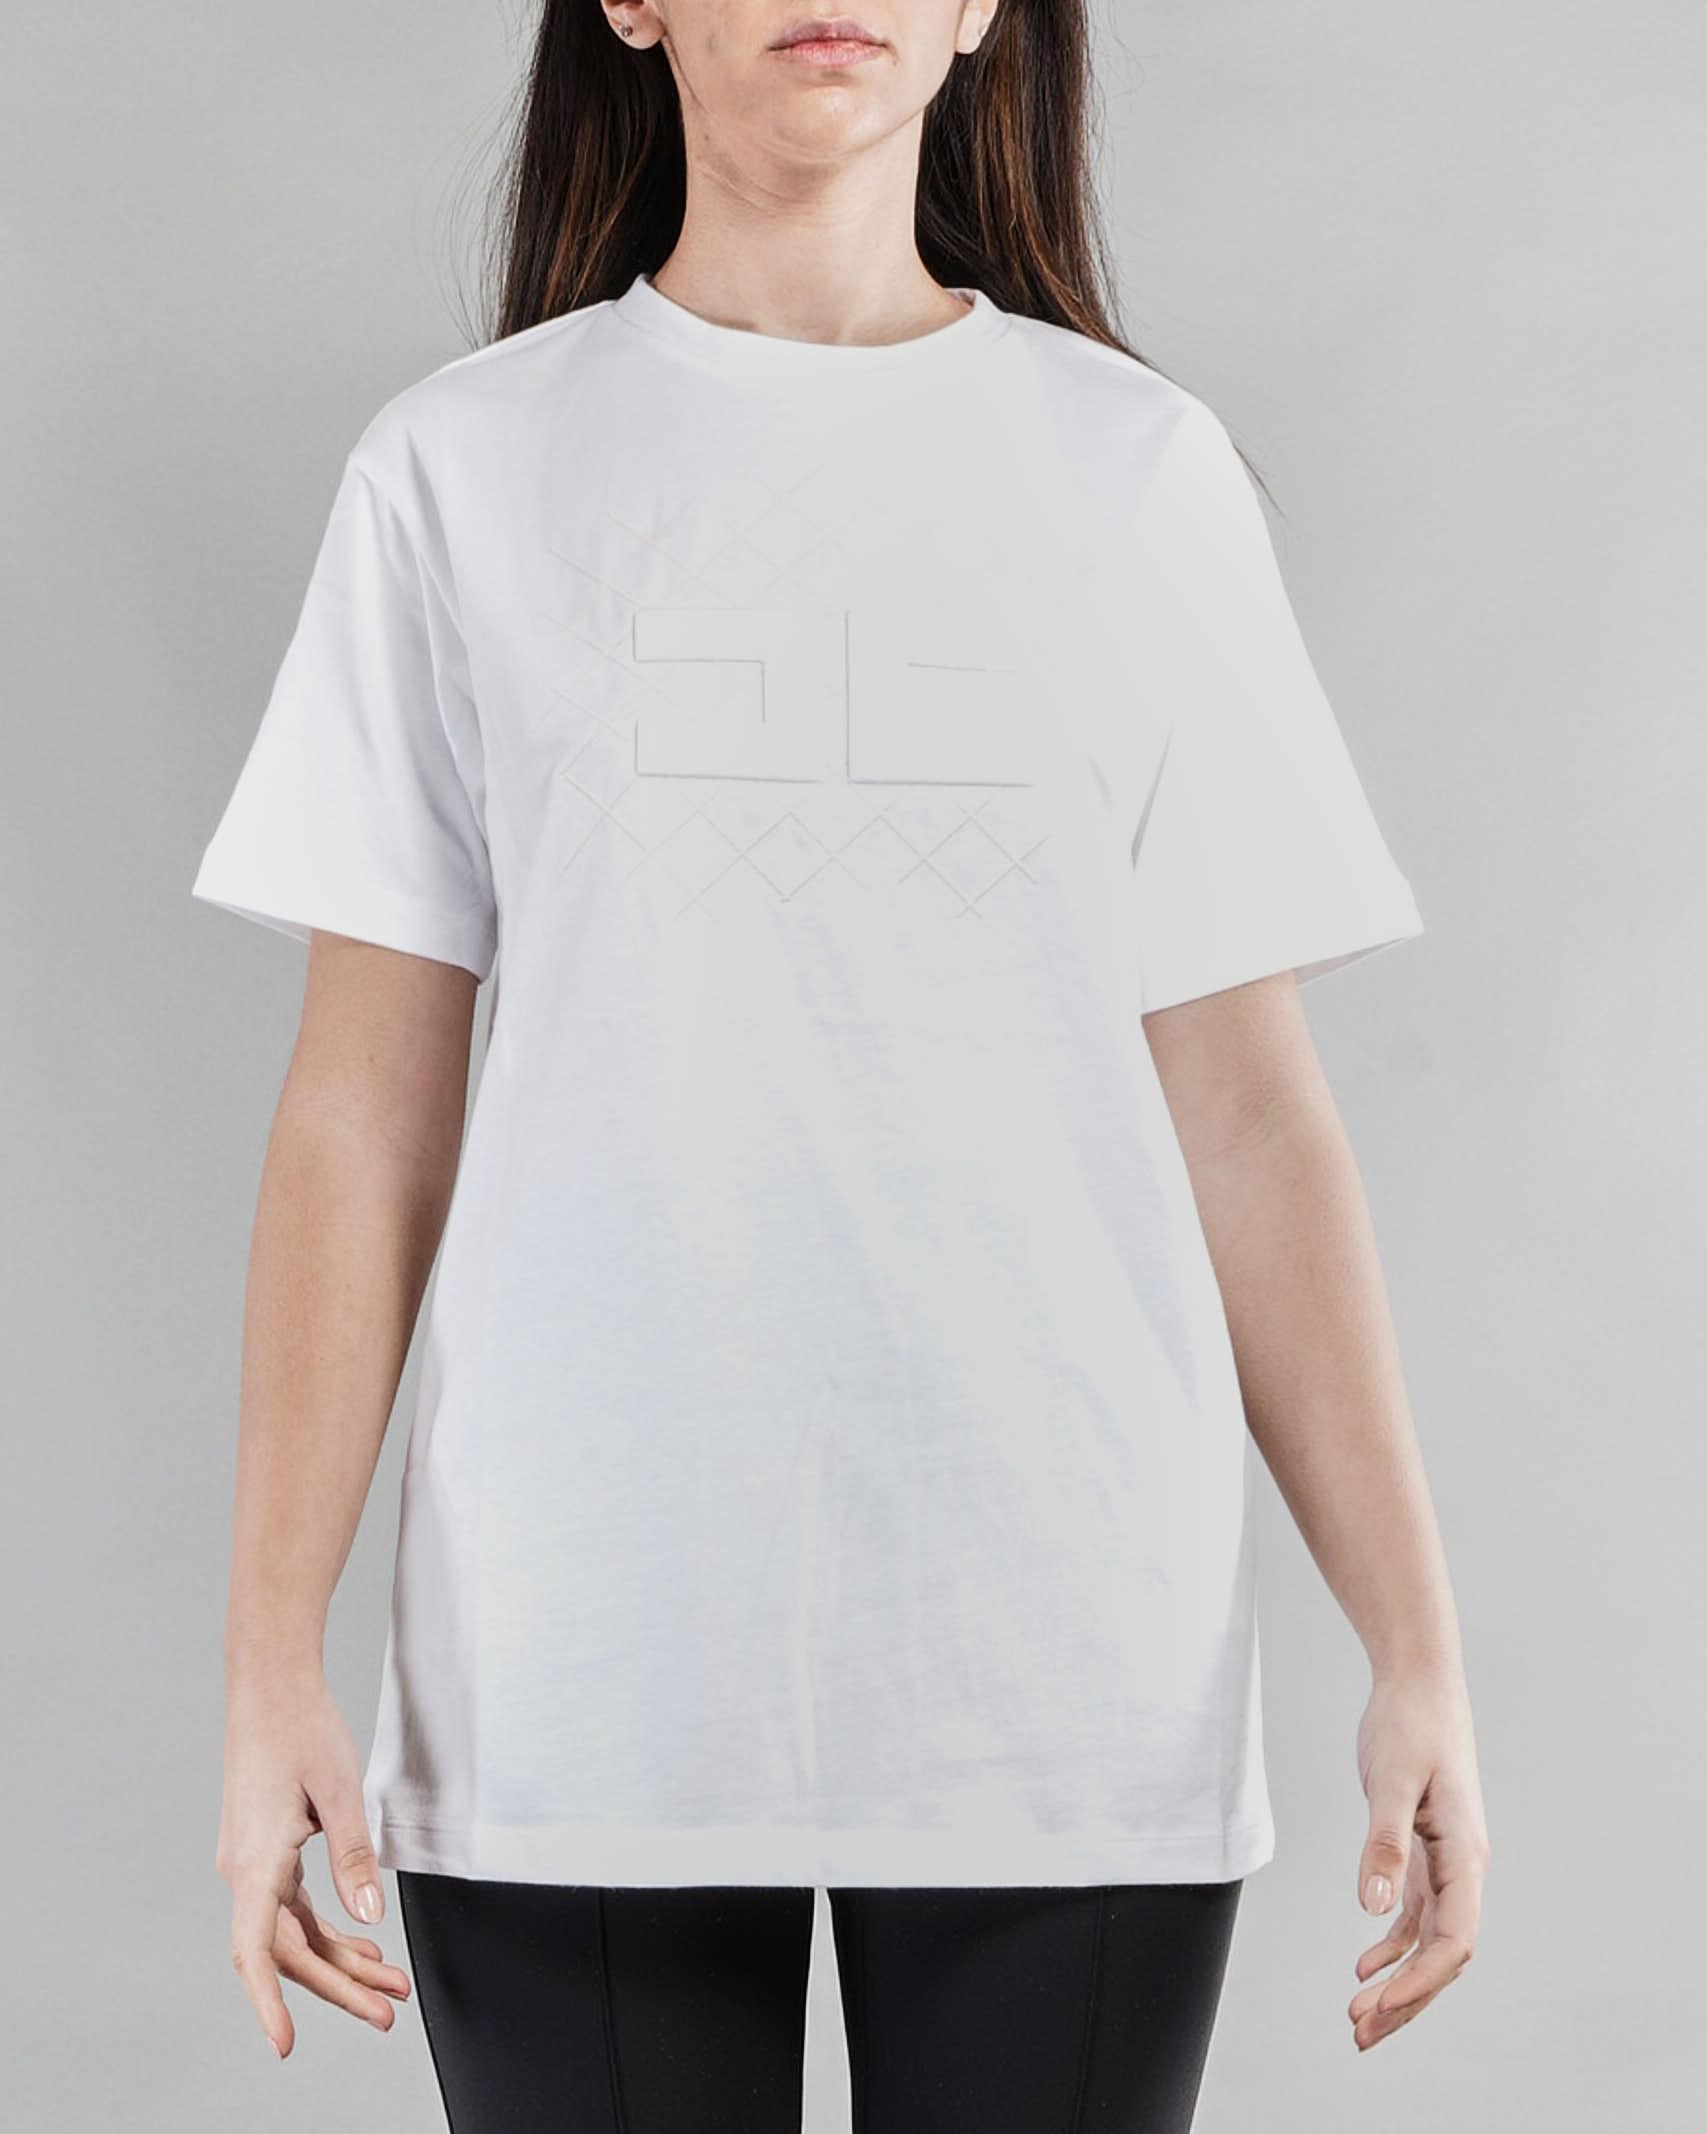 T-shirt lungo con logo in tono Elisabetta Franchi ELISABETTA FRANCHI | T-shirt | MA19611E2270